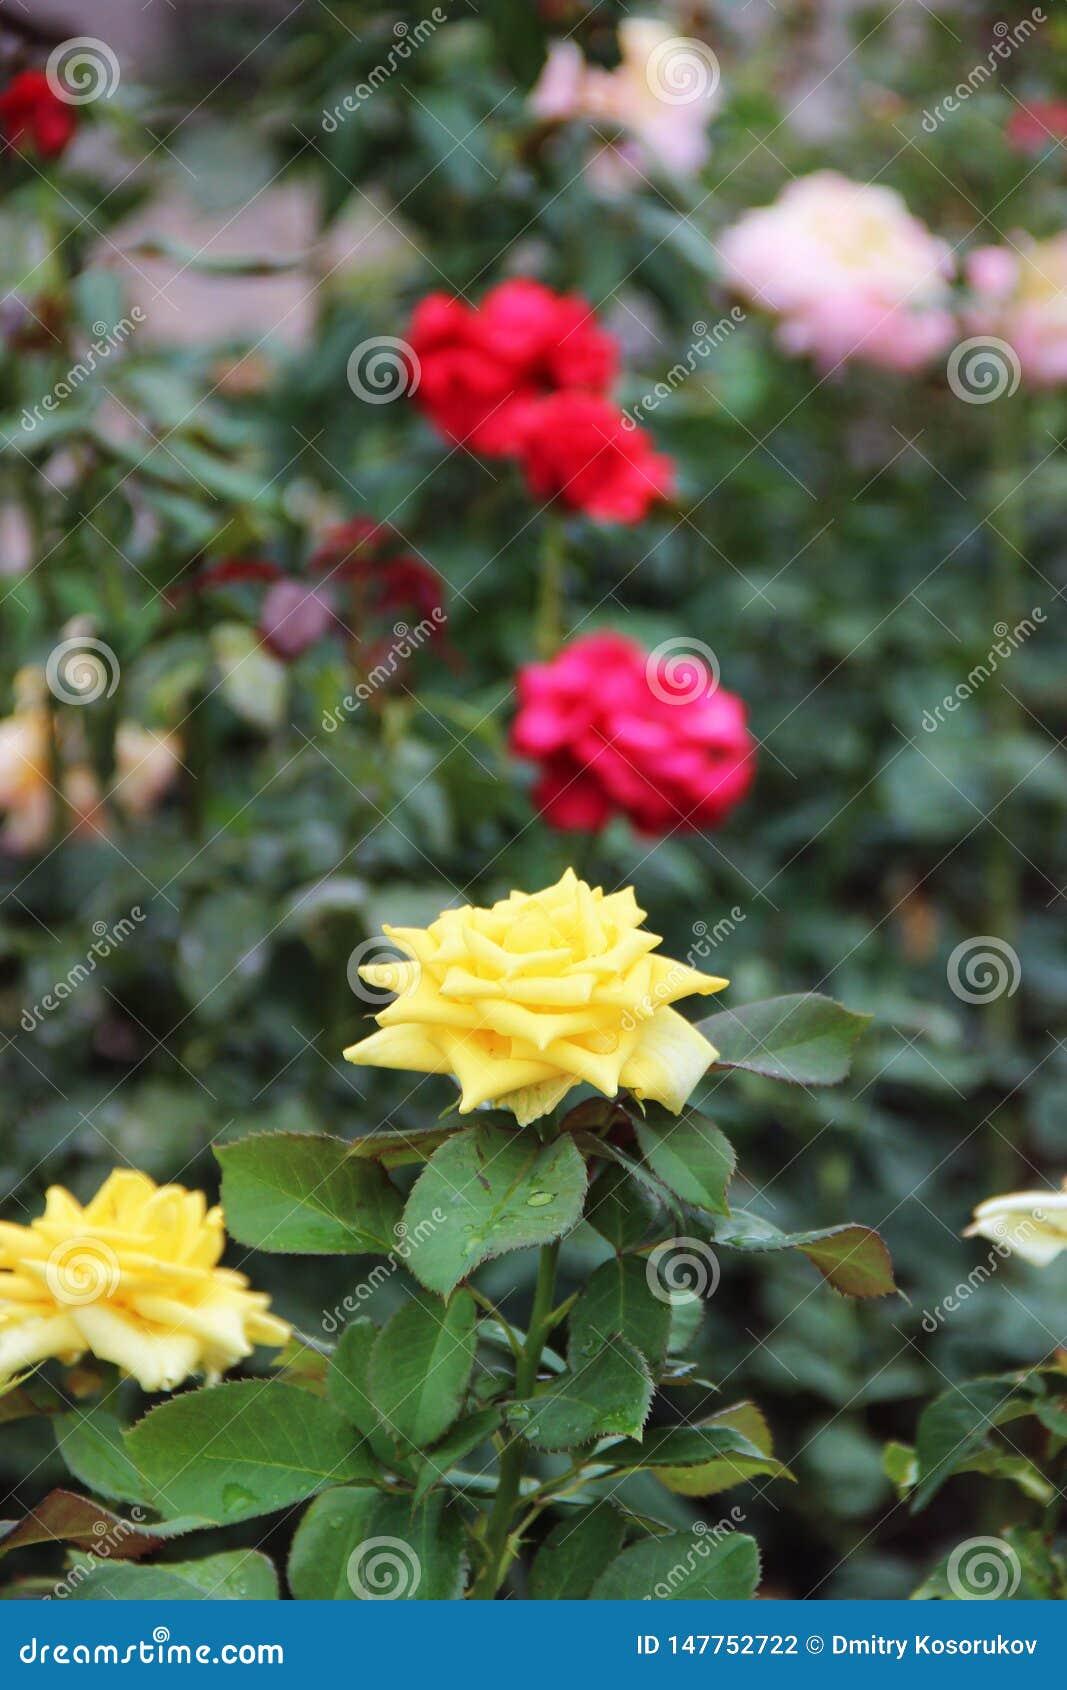 White rose Bud on a Bush